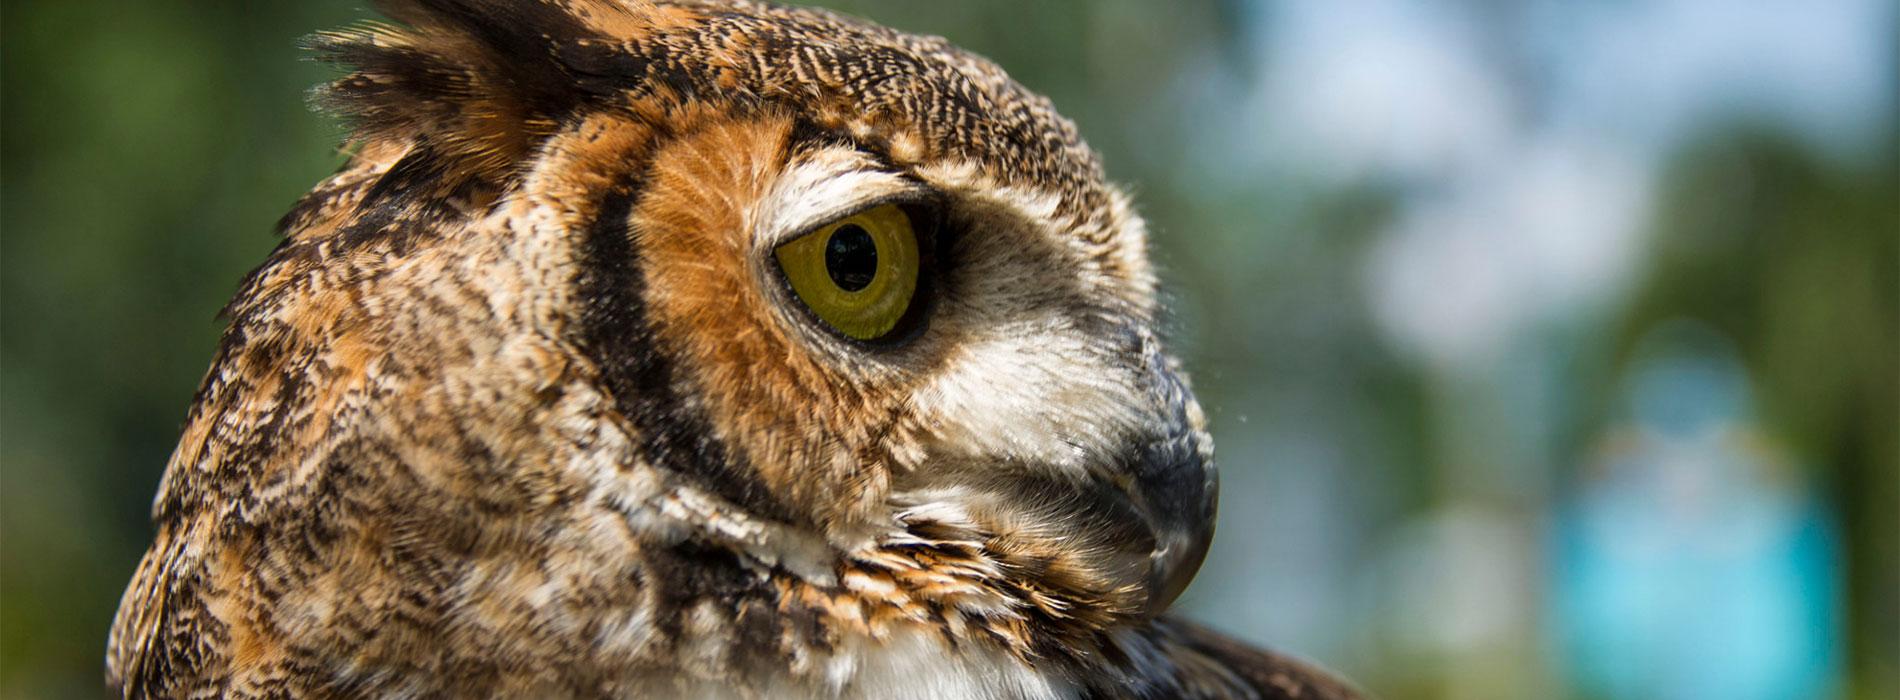 owl side profile